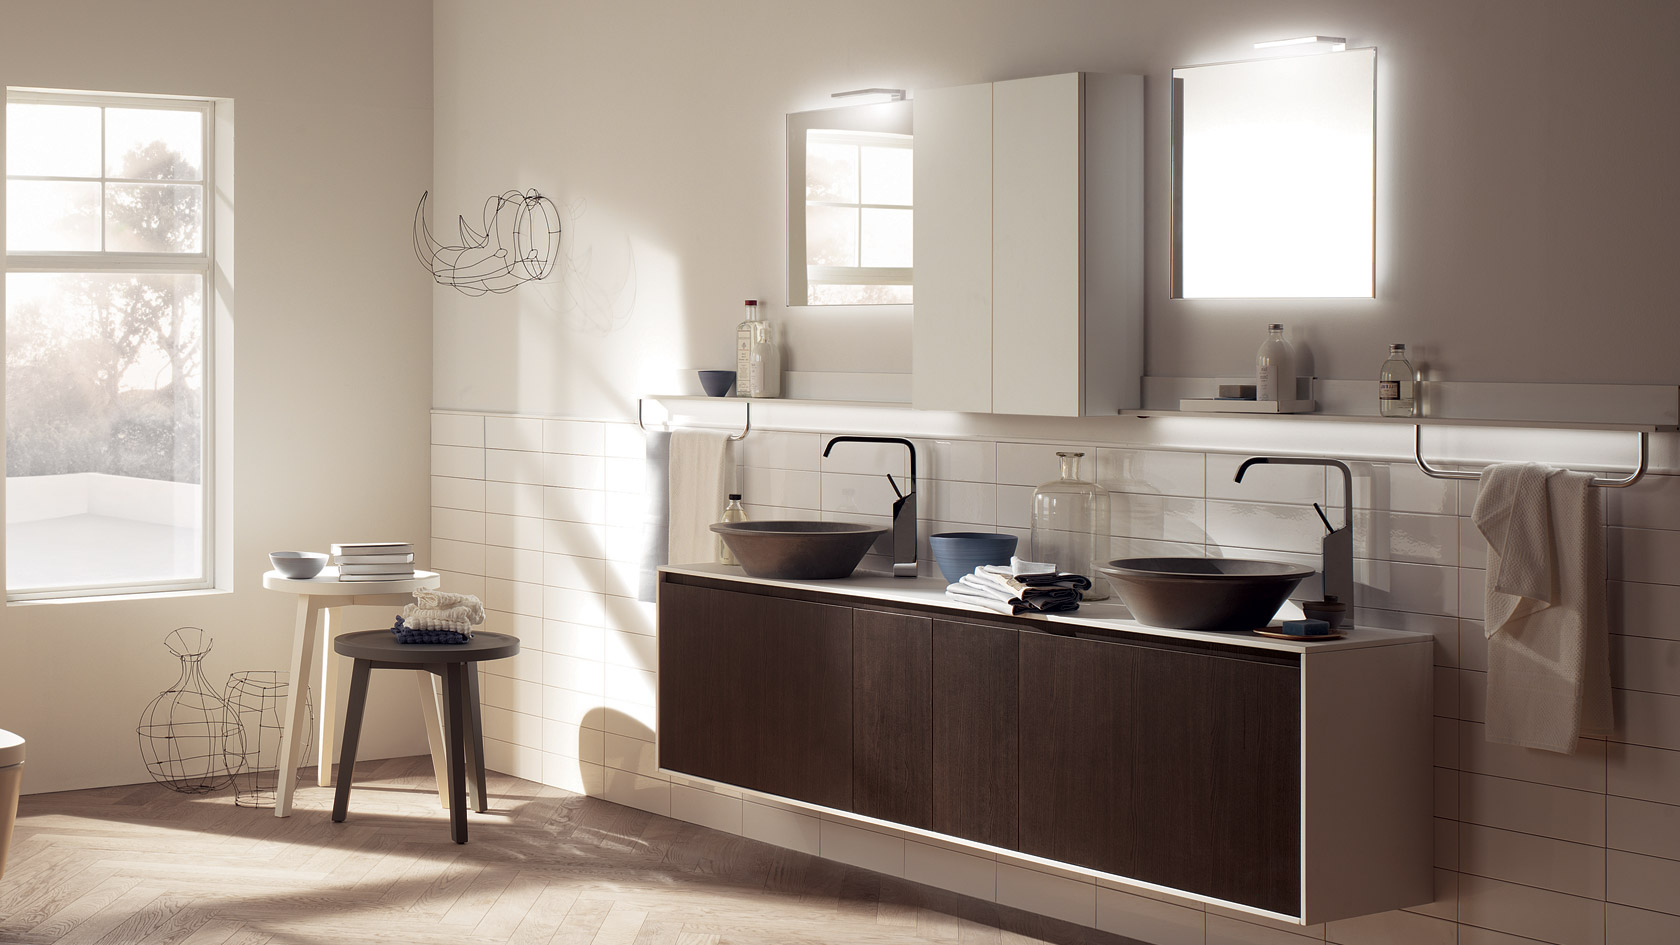 Vasca Da Bagno Kami Scavolini : Prezzi mobili bagno moderni